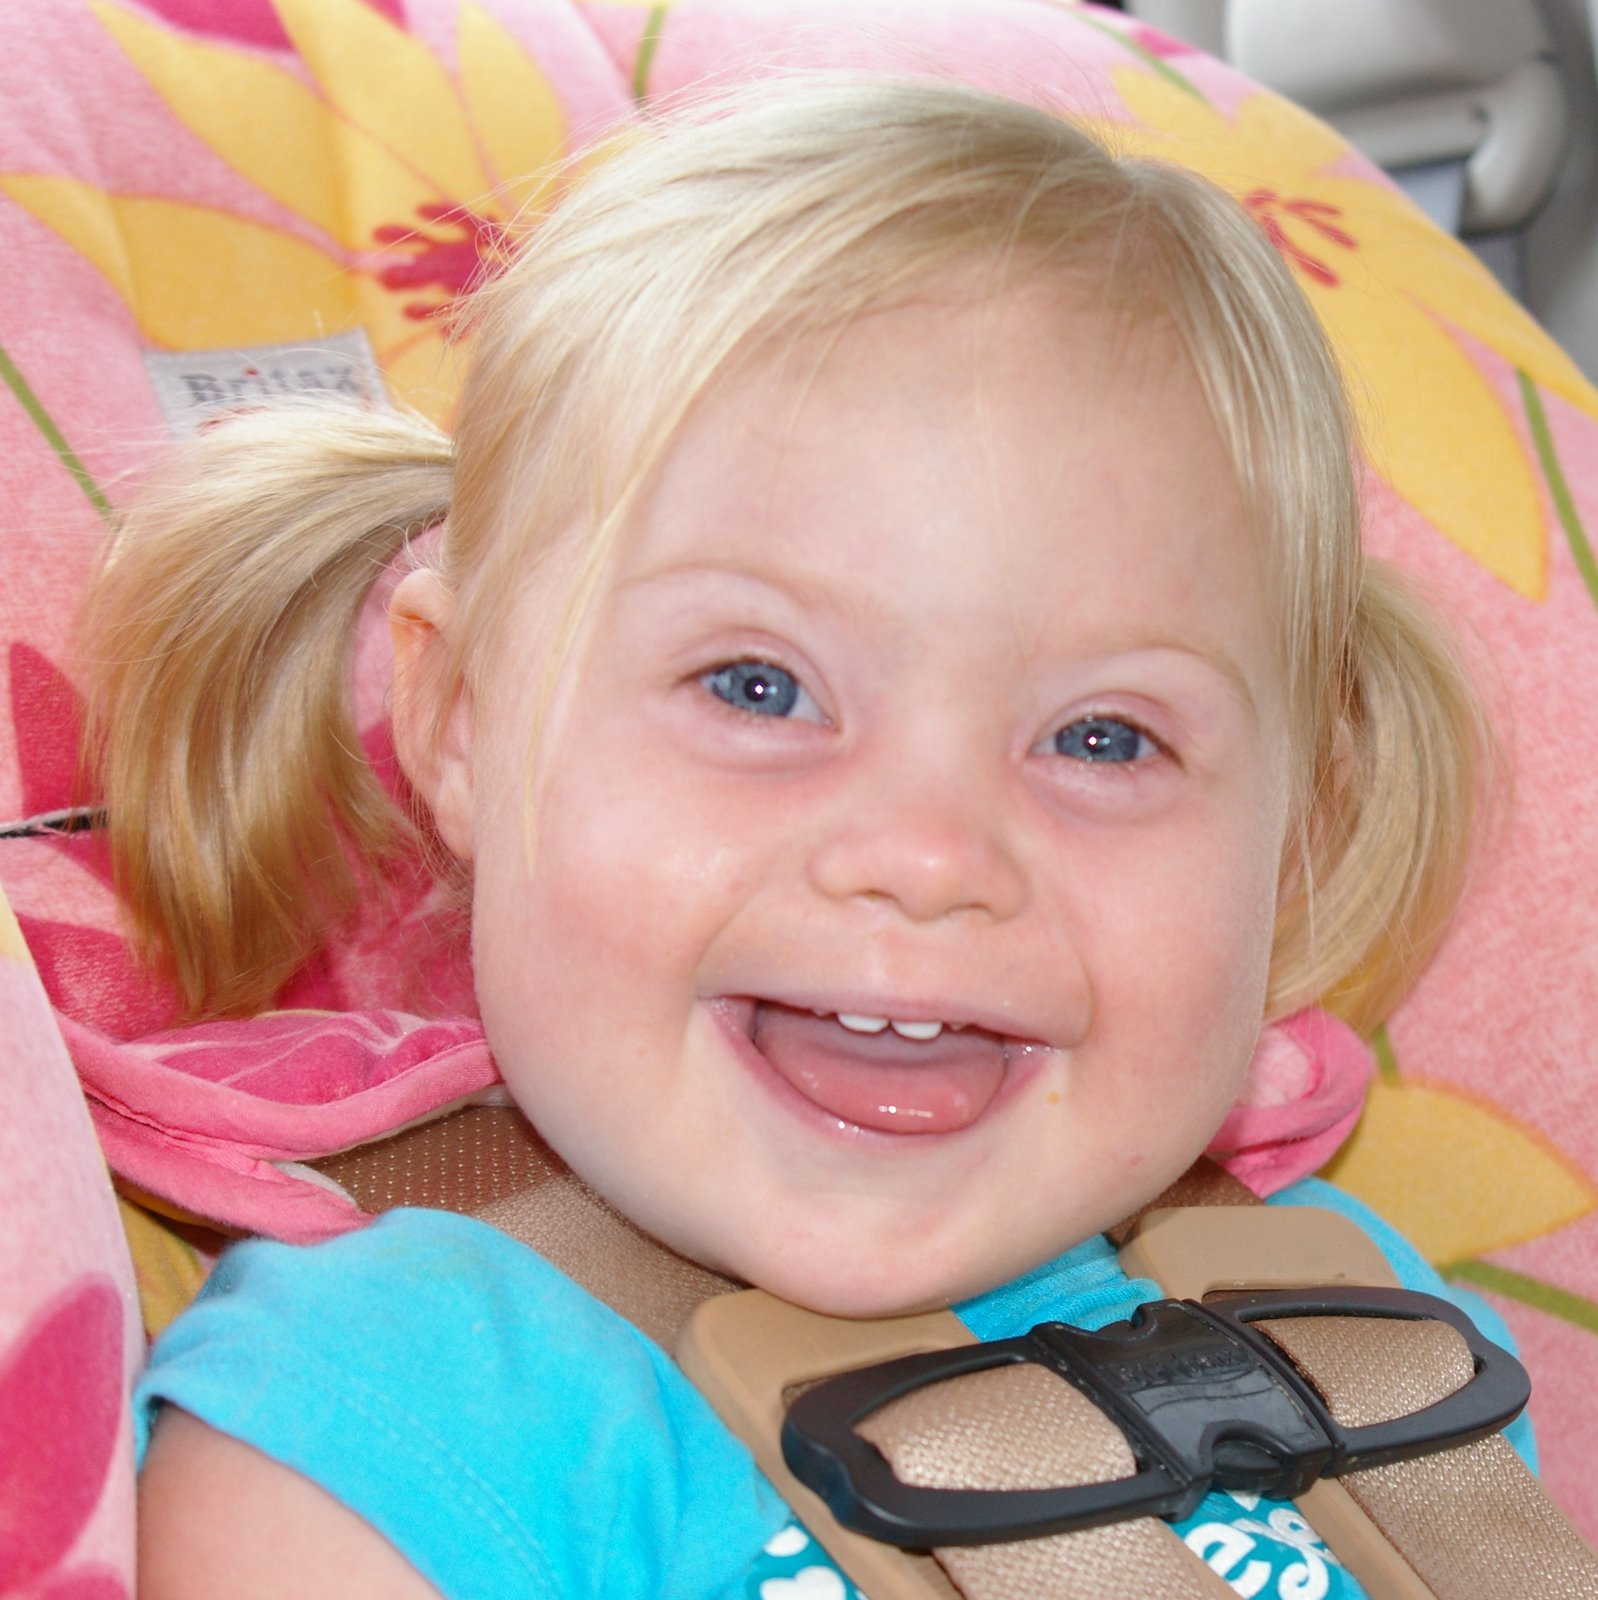 Даун синдром детей 94